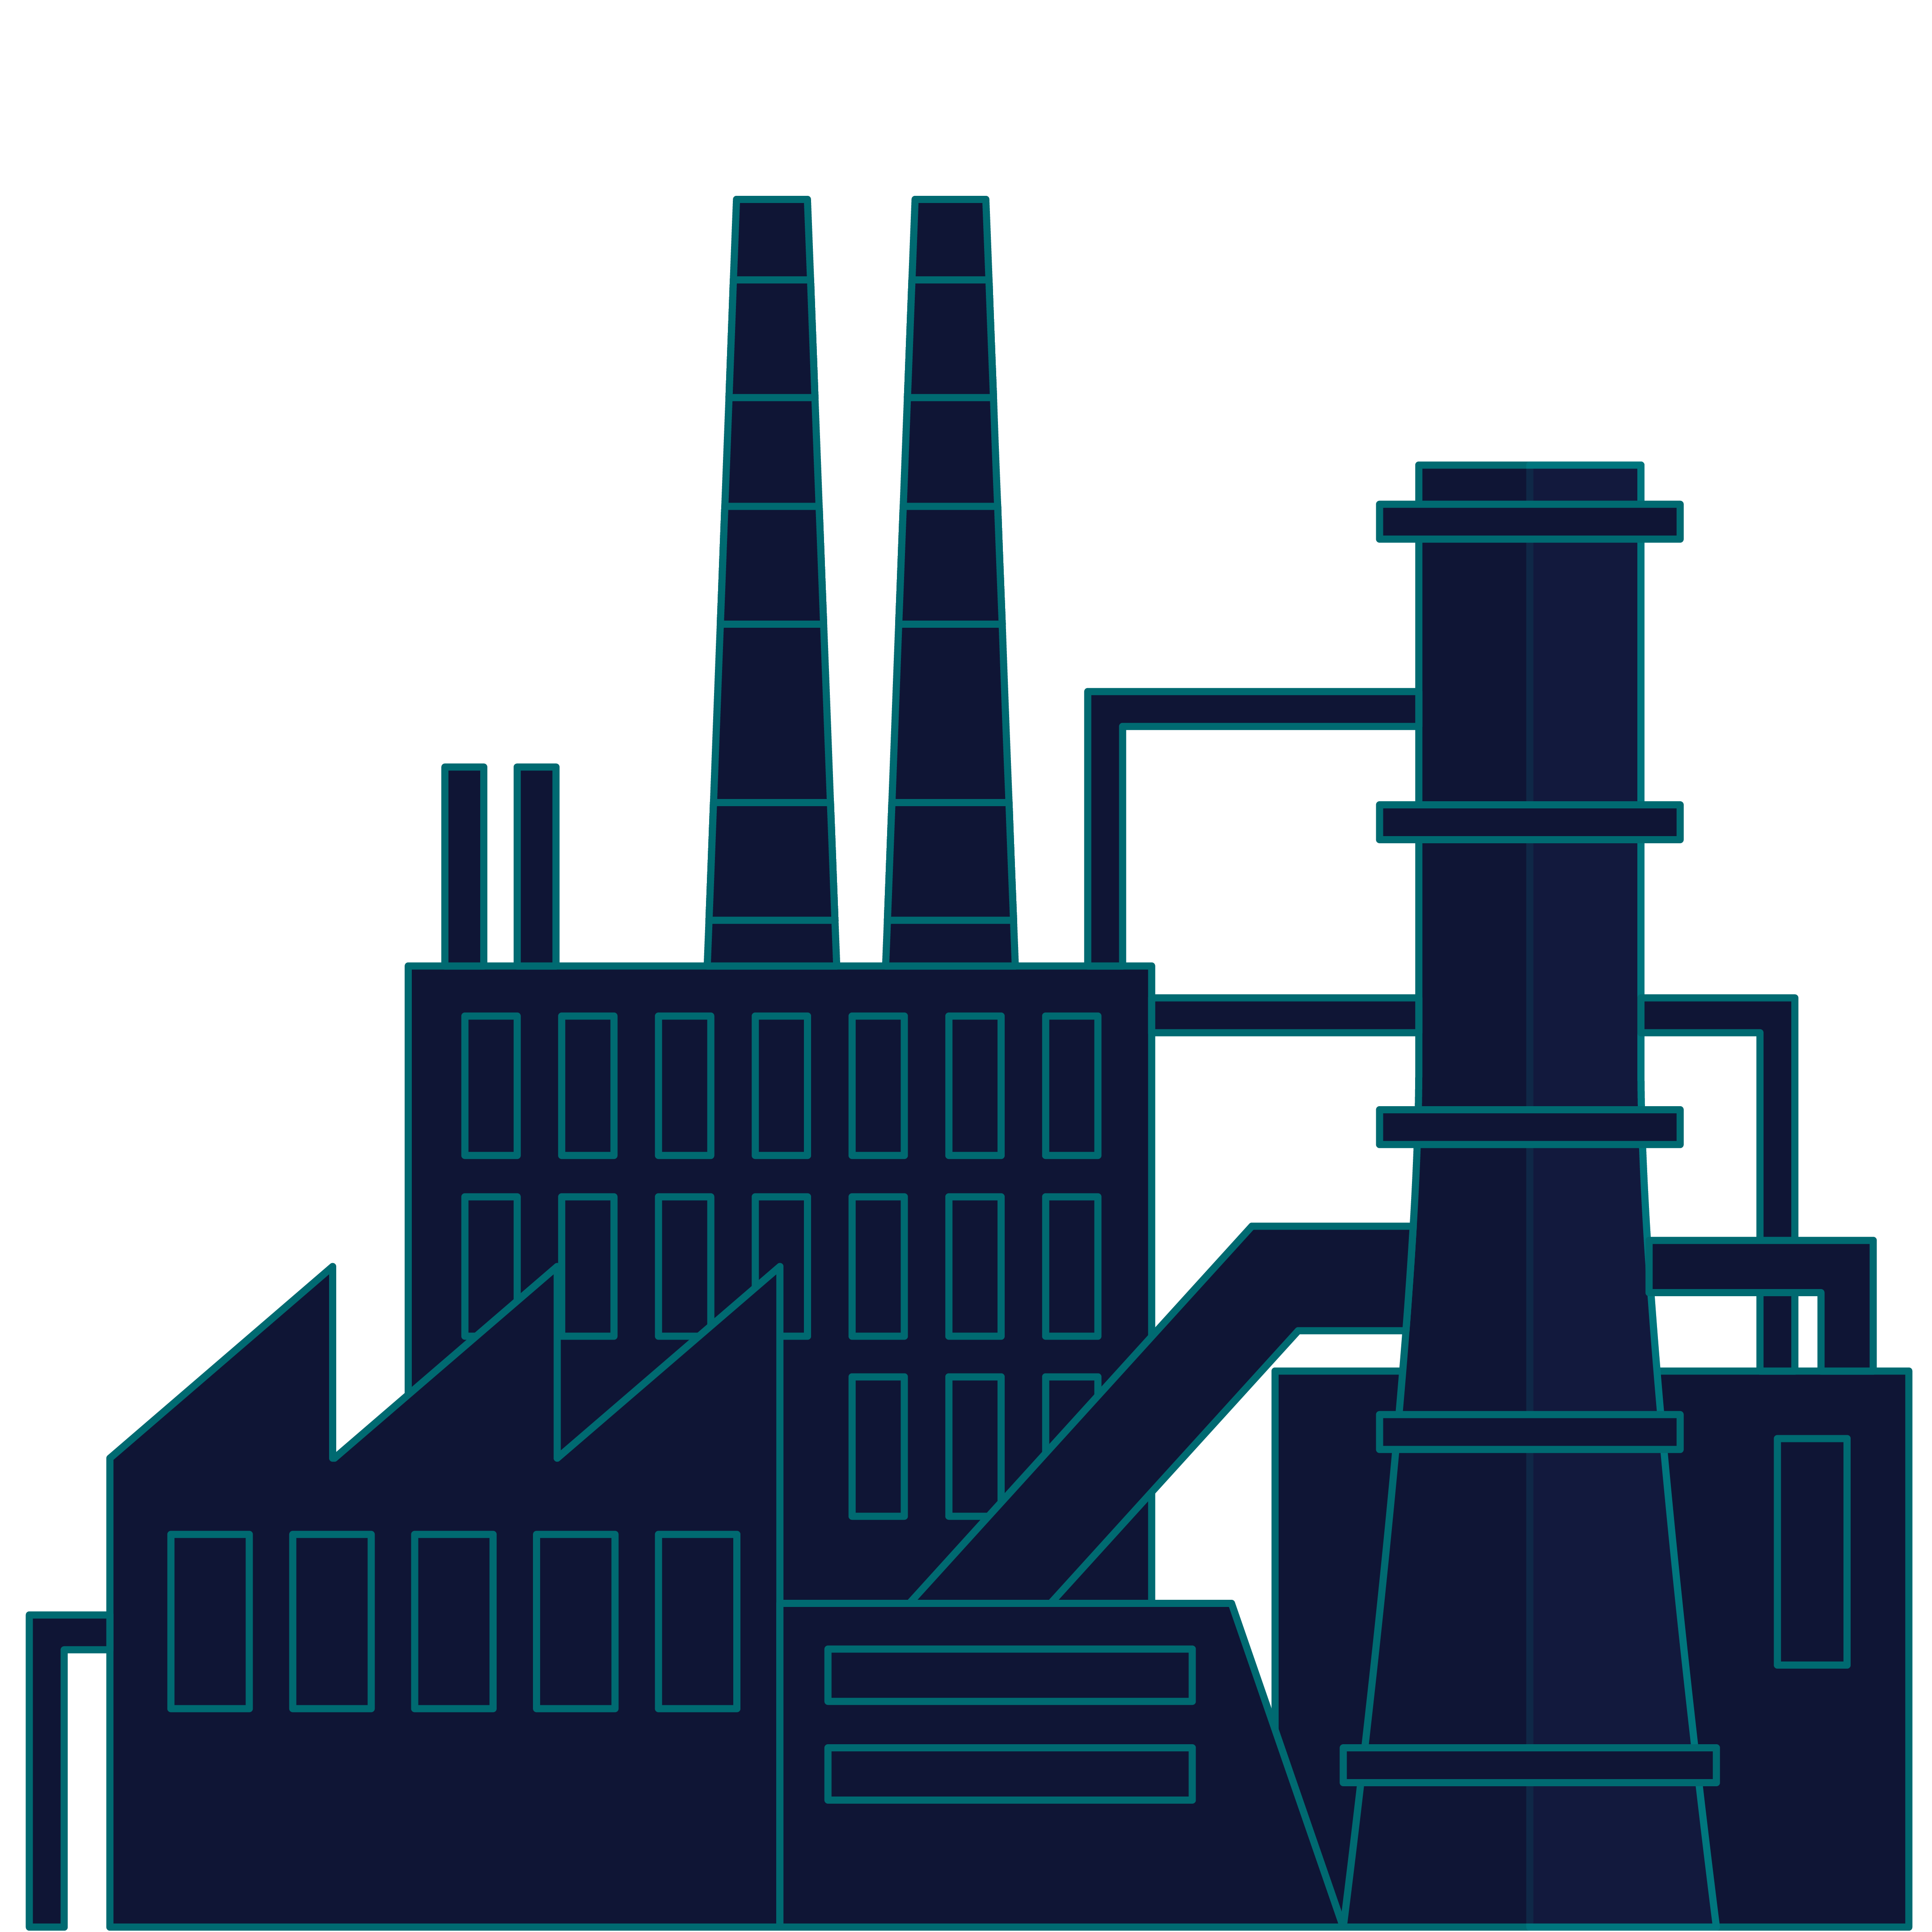 Manufacturing Illustration